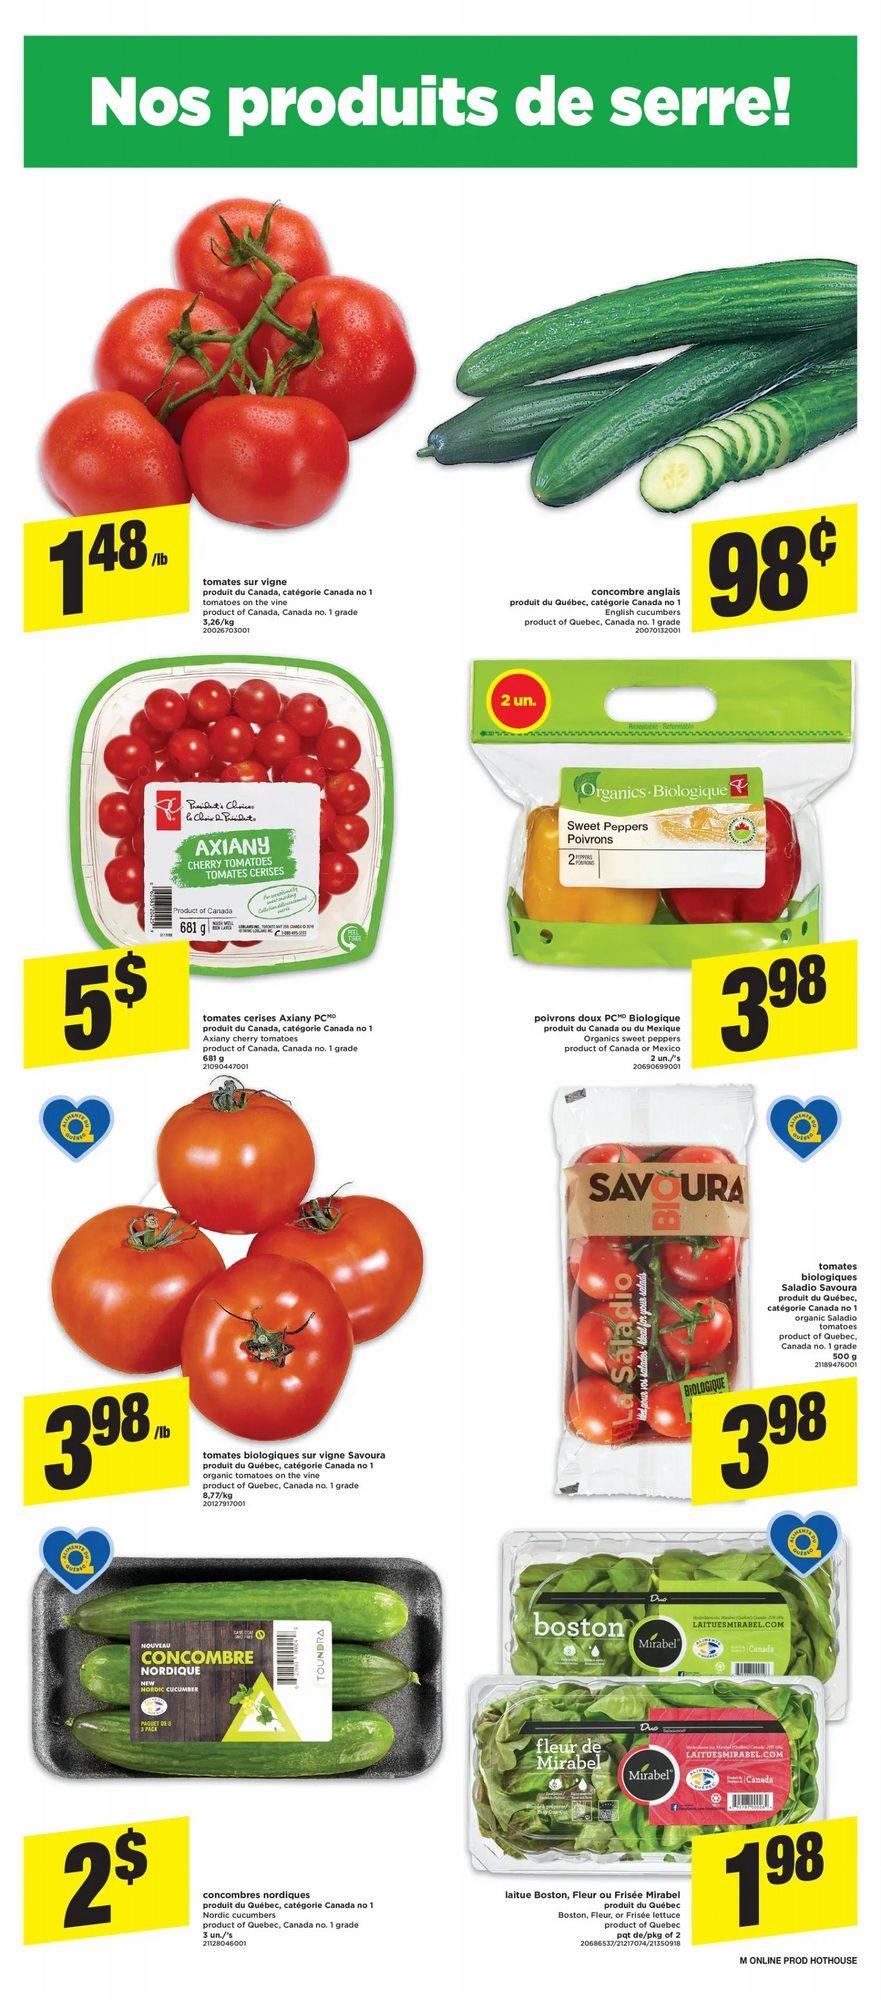 Maxi - Weekly Flyer Specials - Page 4